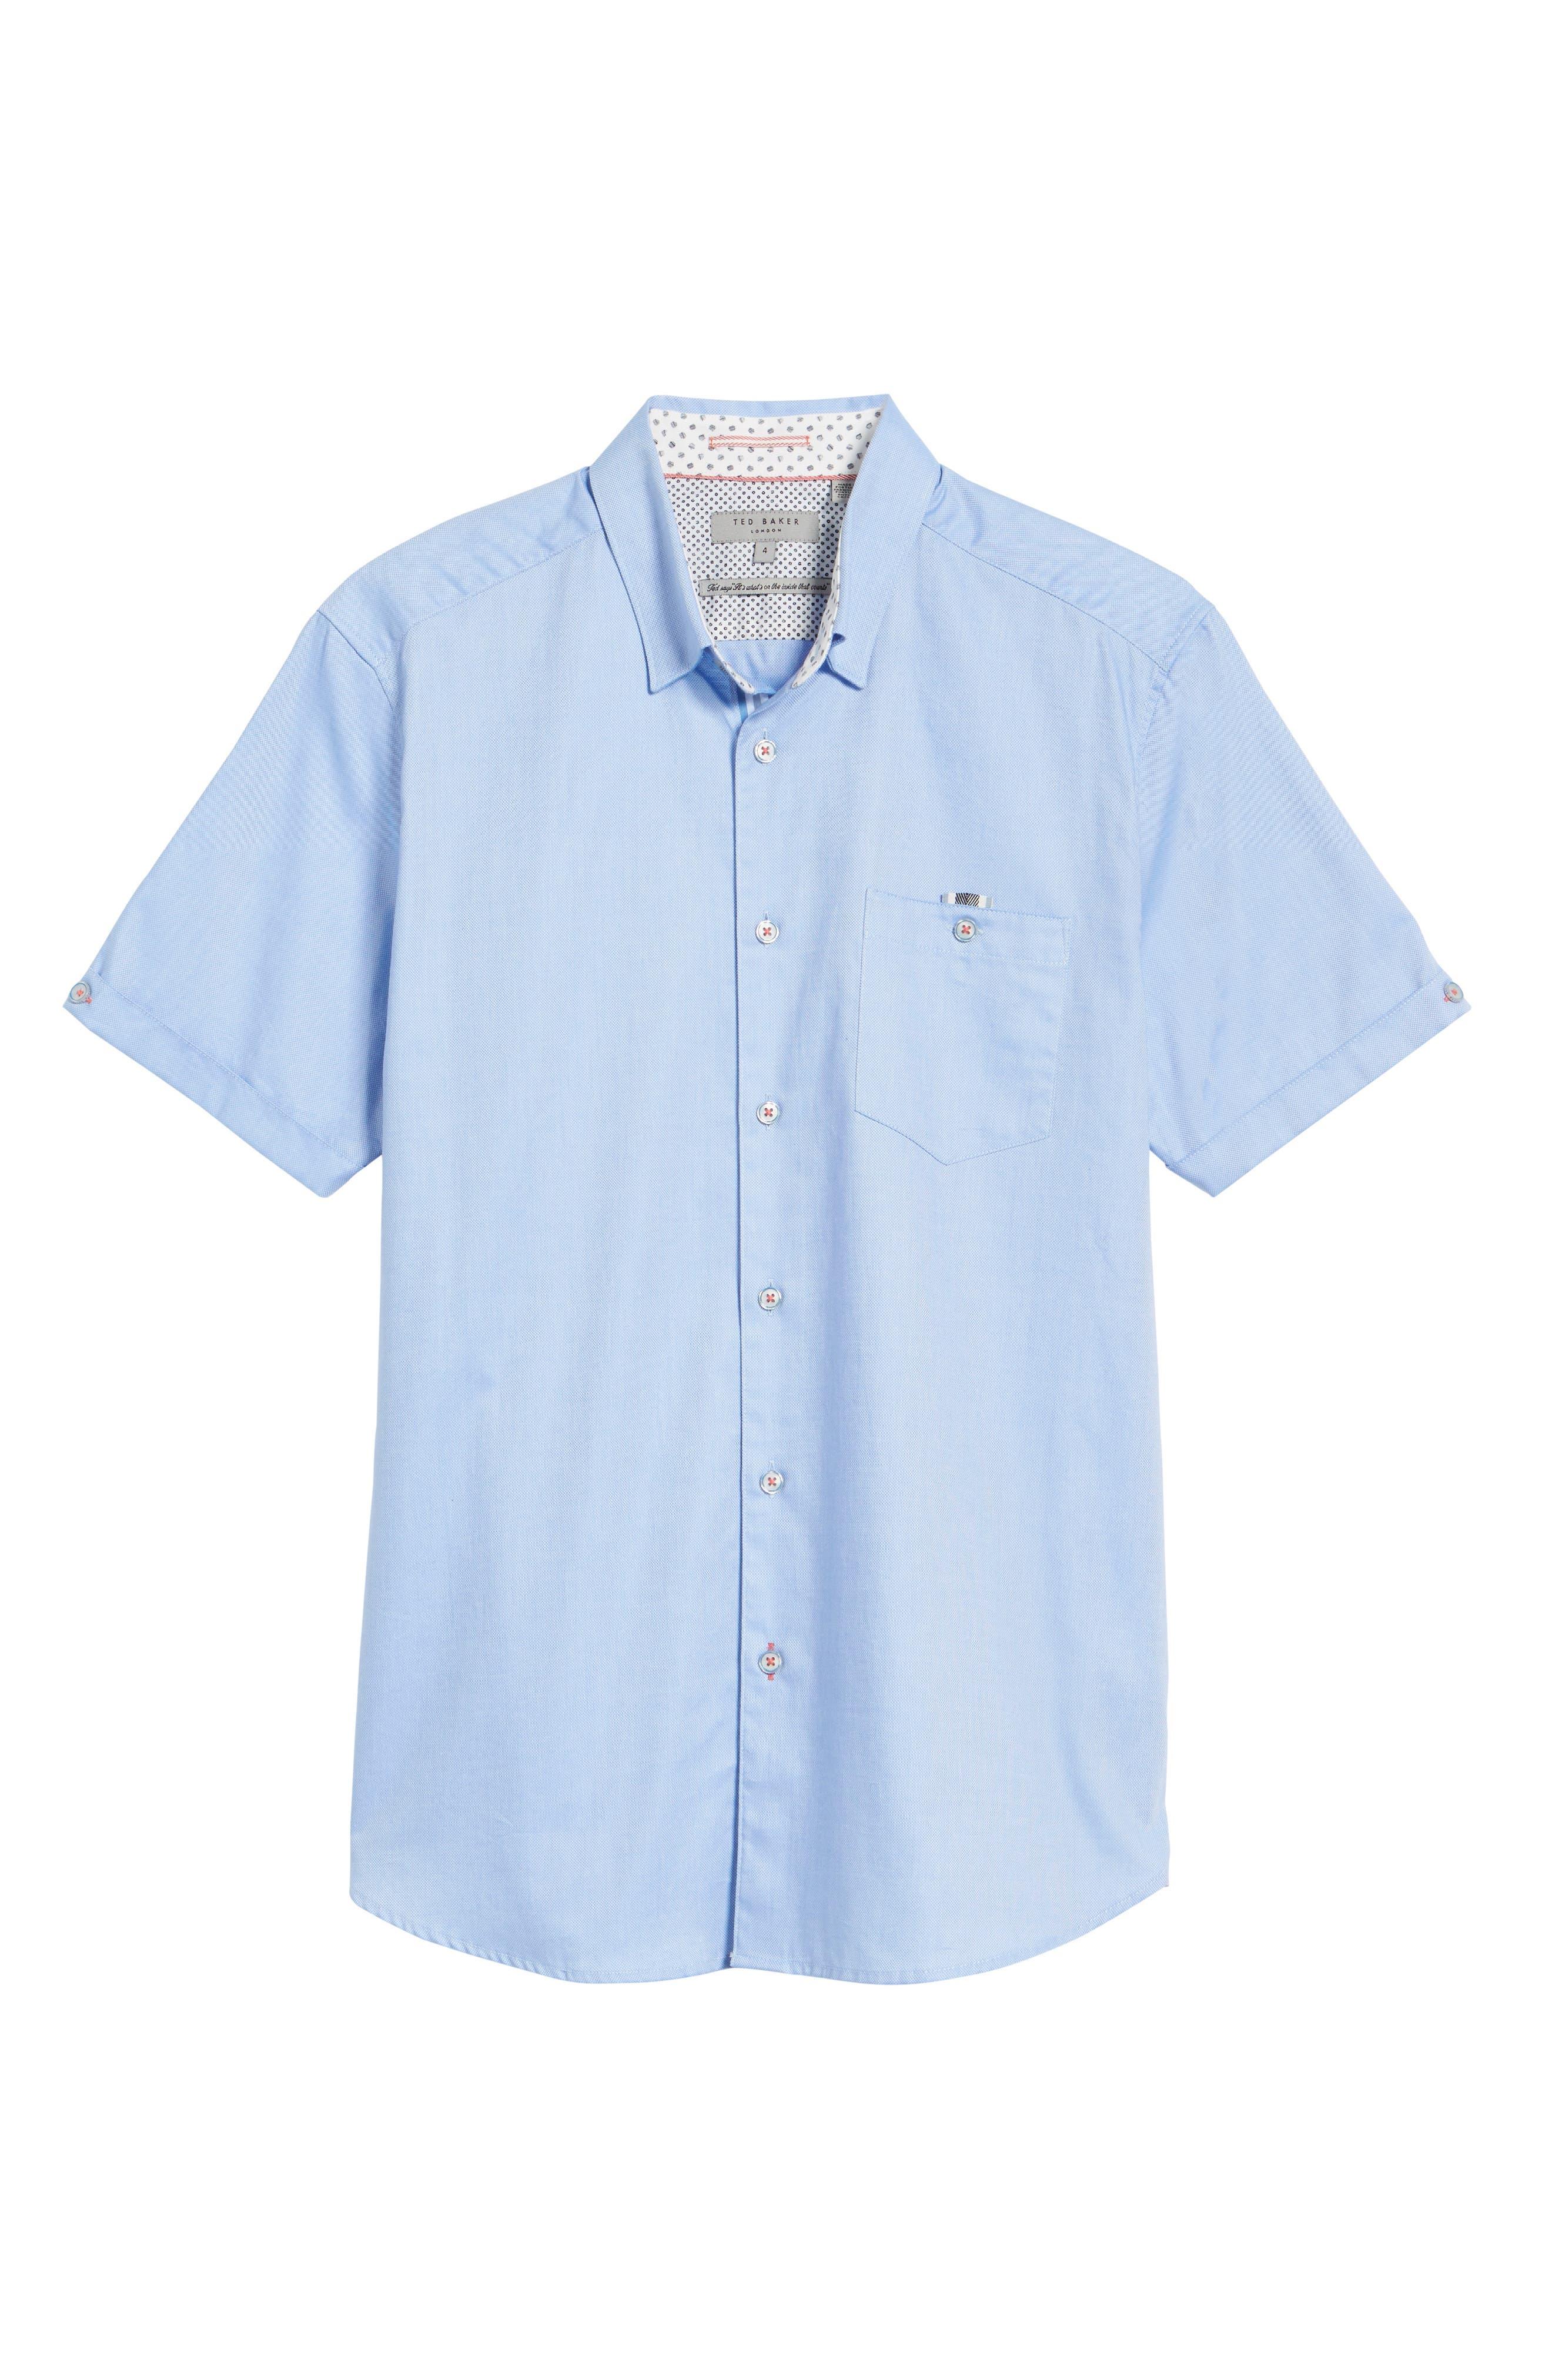 Wallott Extra Slim Fit Short Sleeve Sport Shirt,                             Alternate thumbnail 6, color,                             Blue